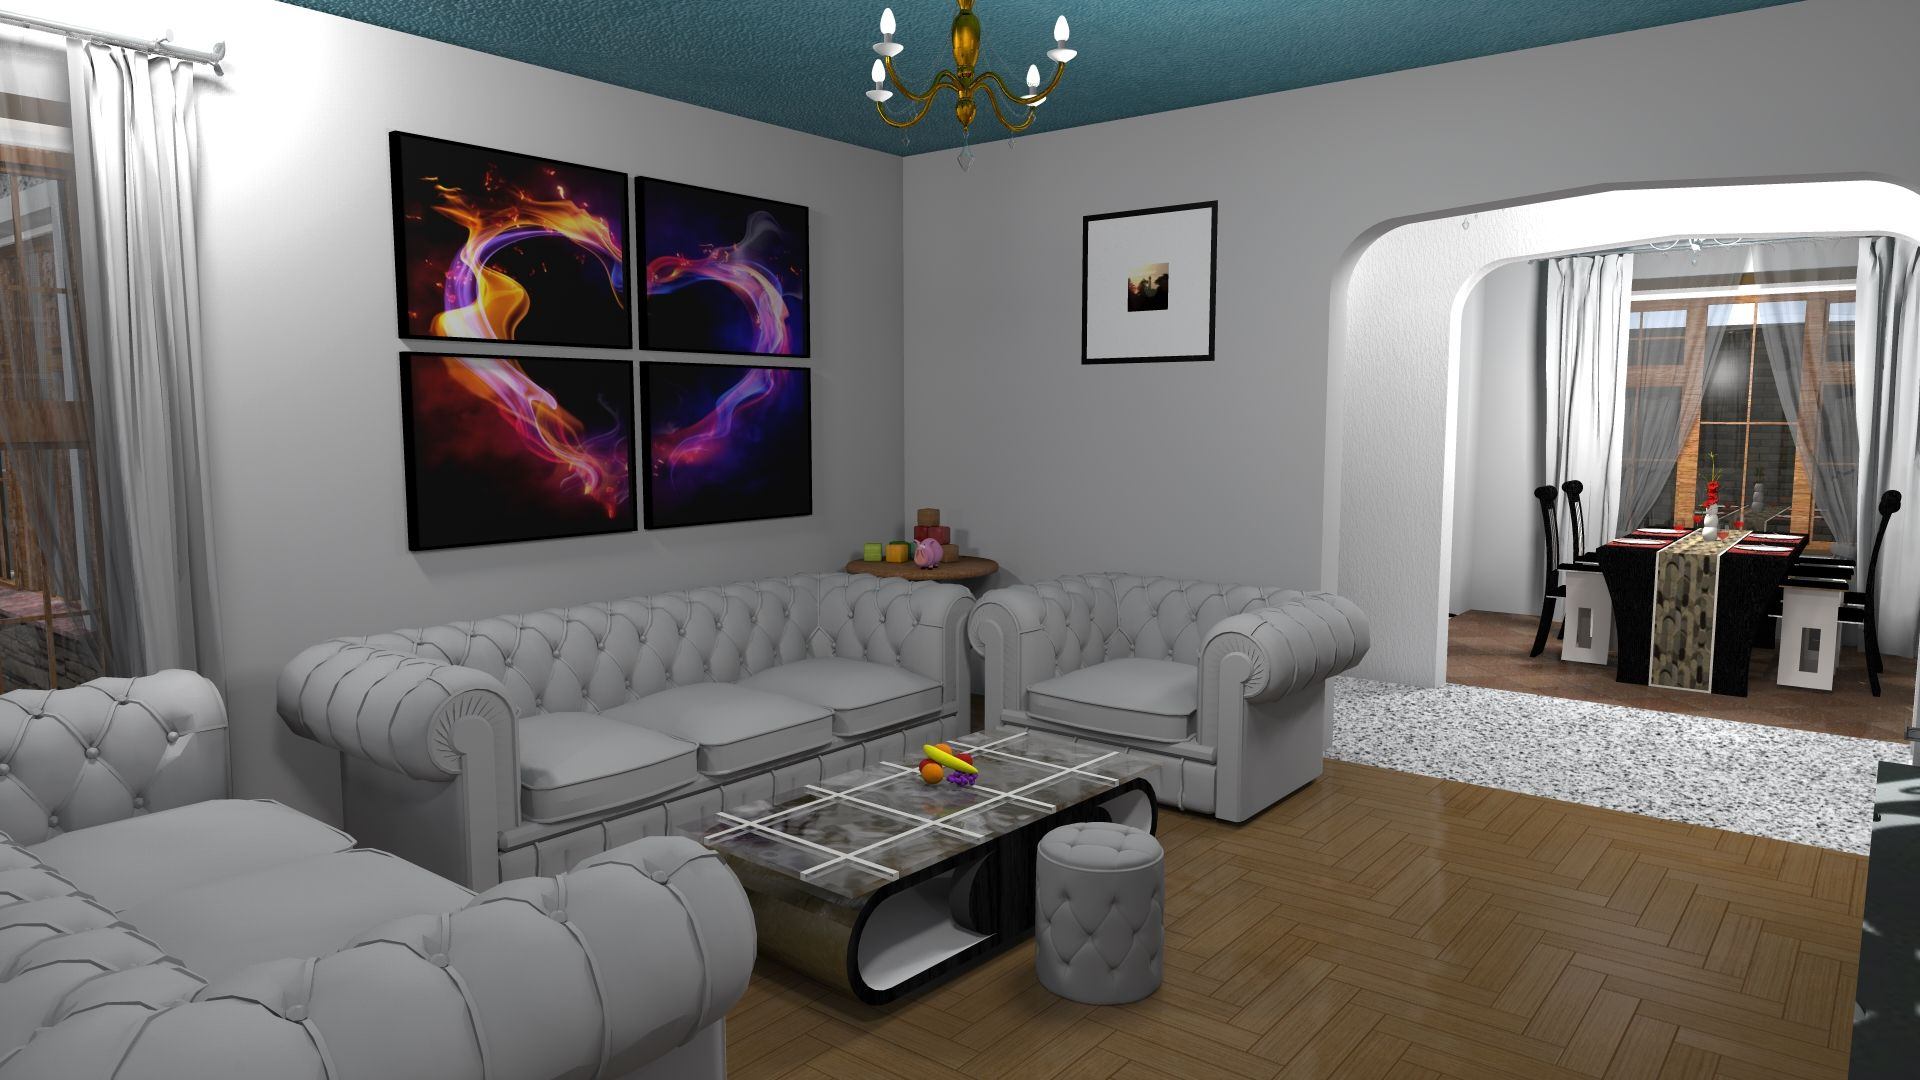 Three Bedroom Bungalow House Design in Kenya in 2020